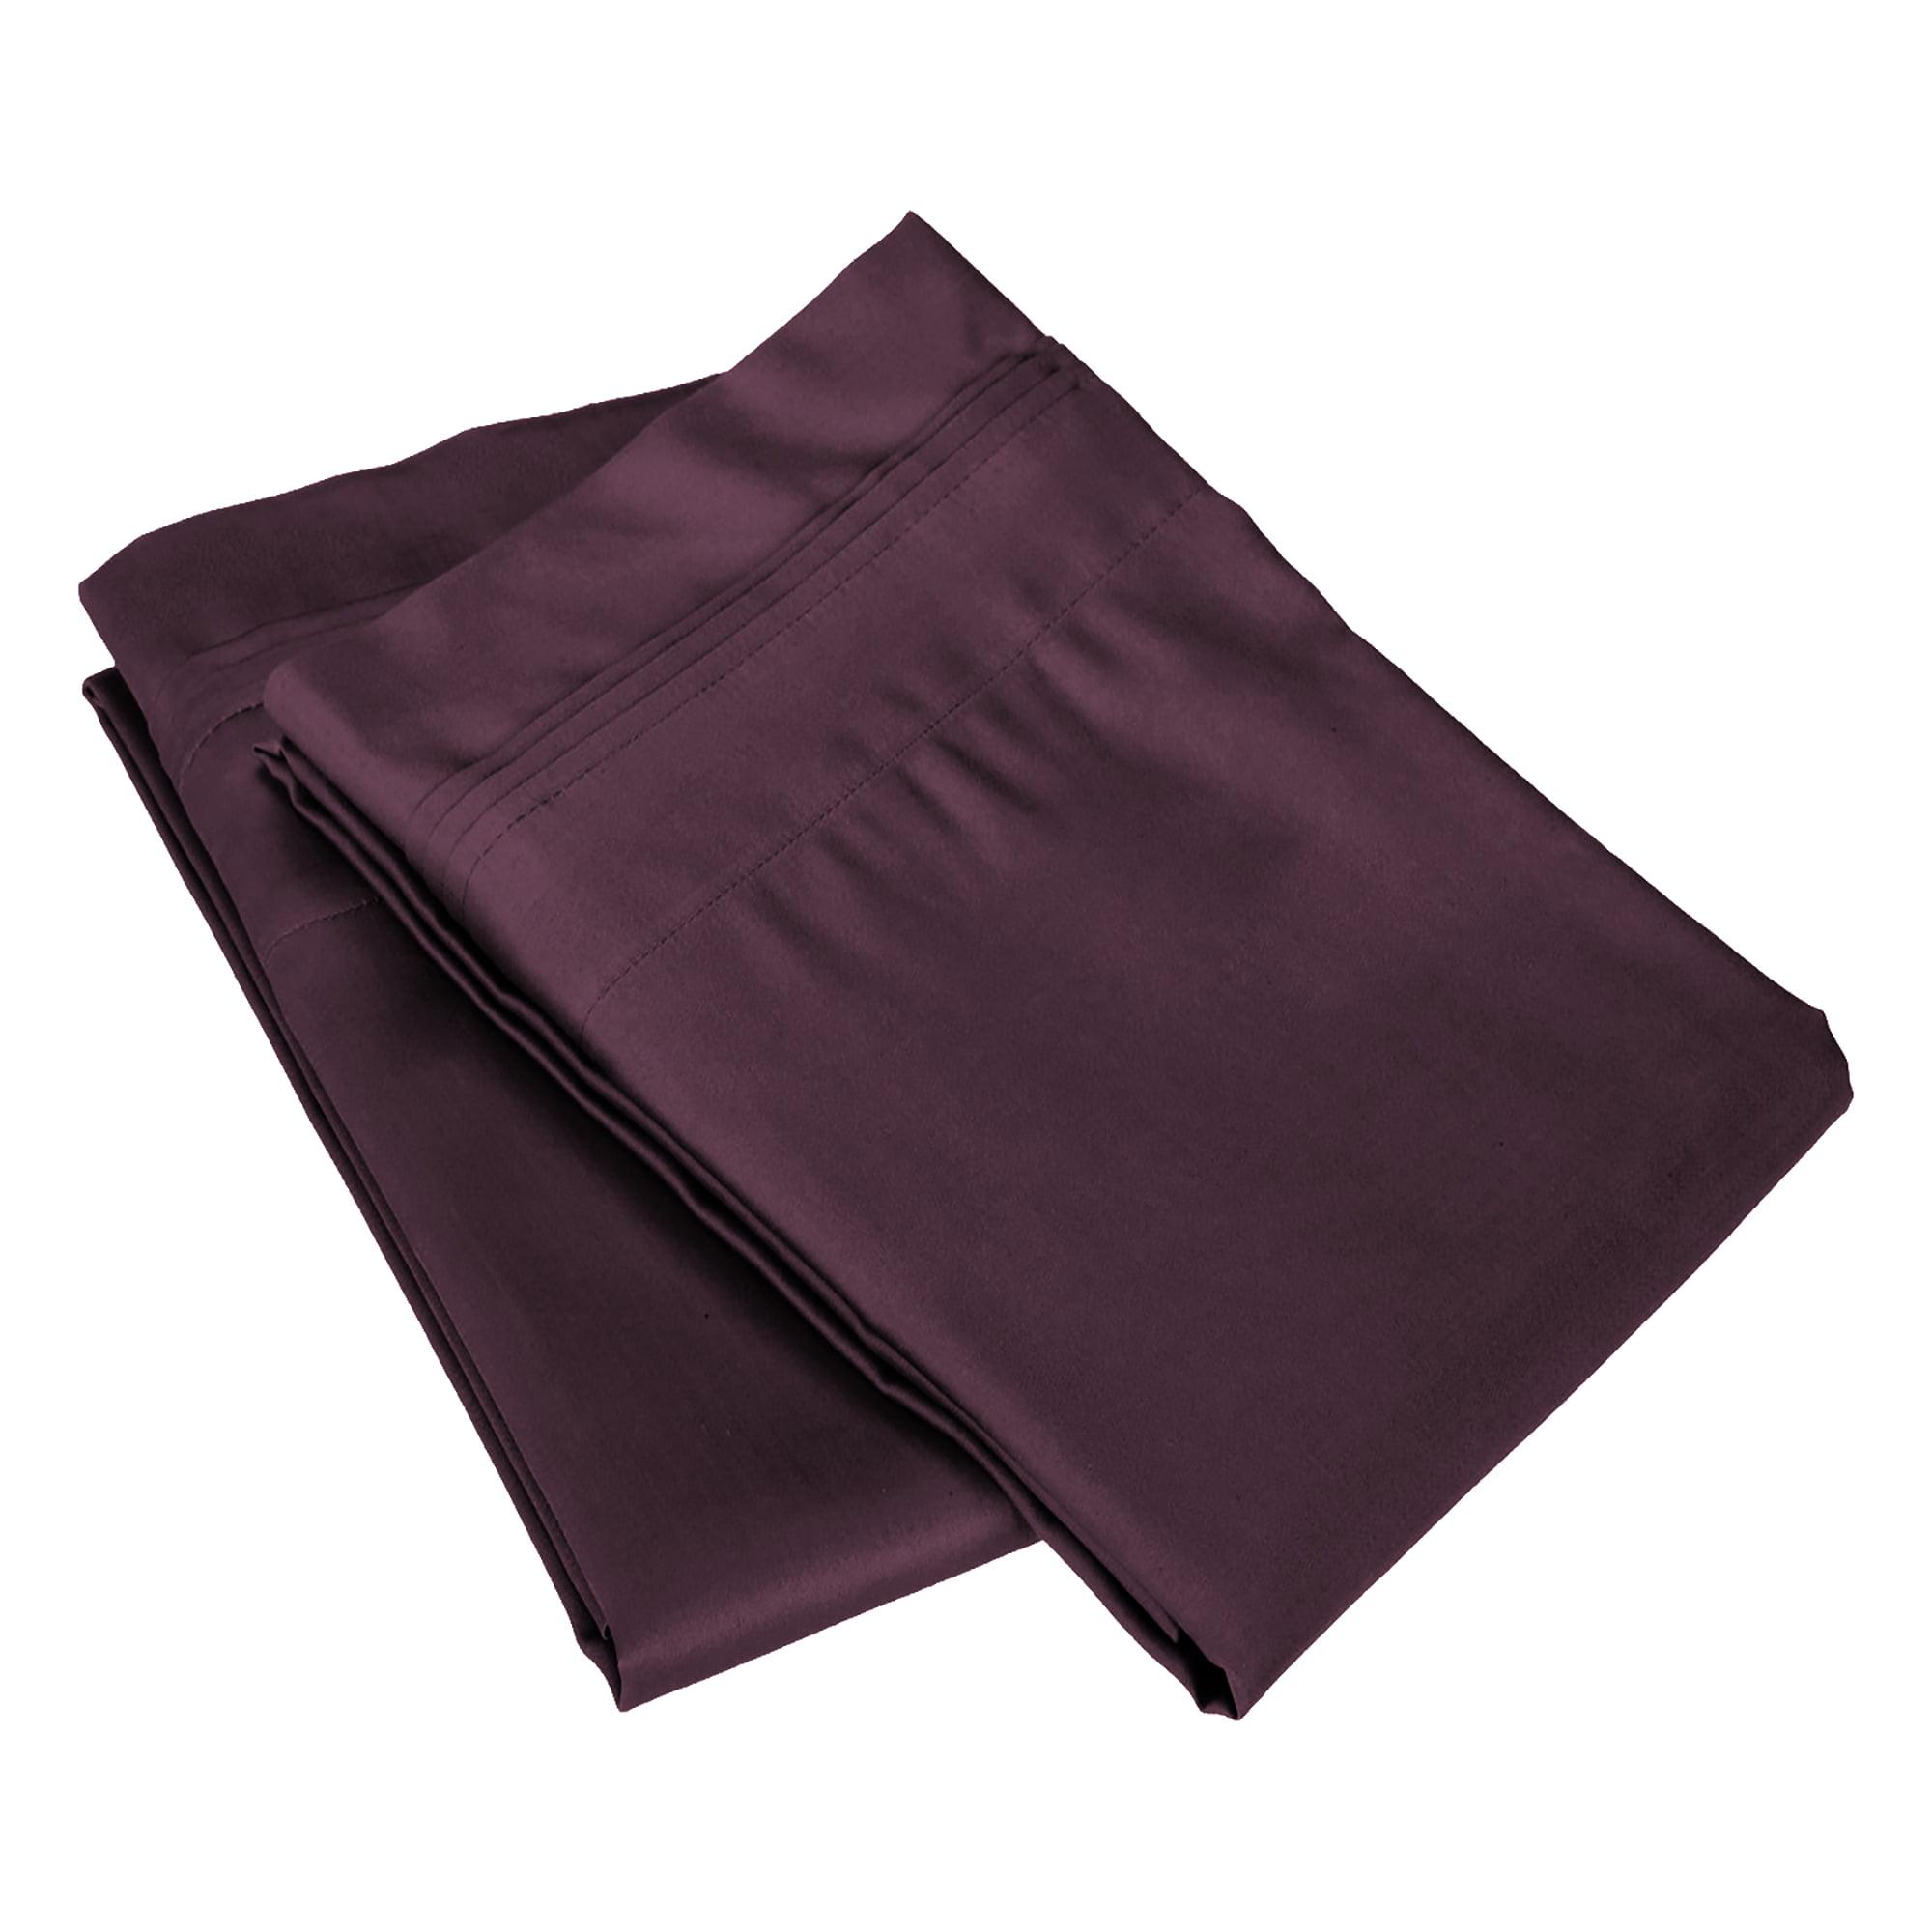 Superior 650 Thread Count Egyptian Cotton Solid Pillowcase Set